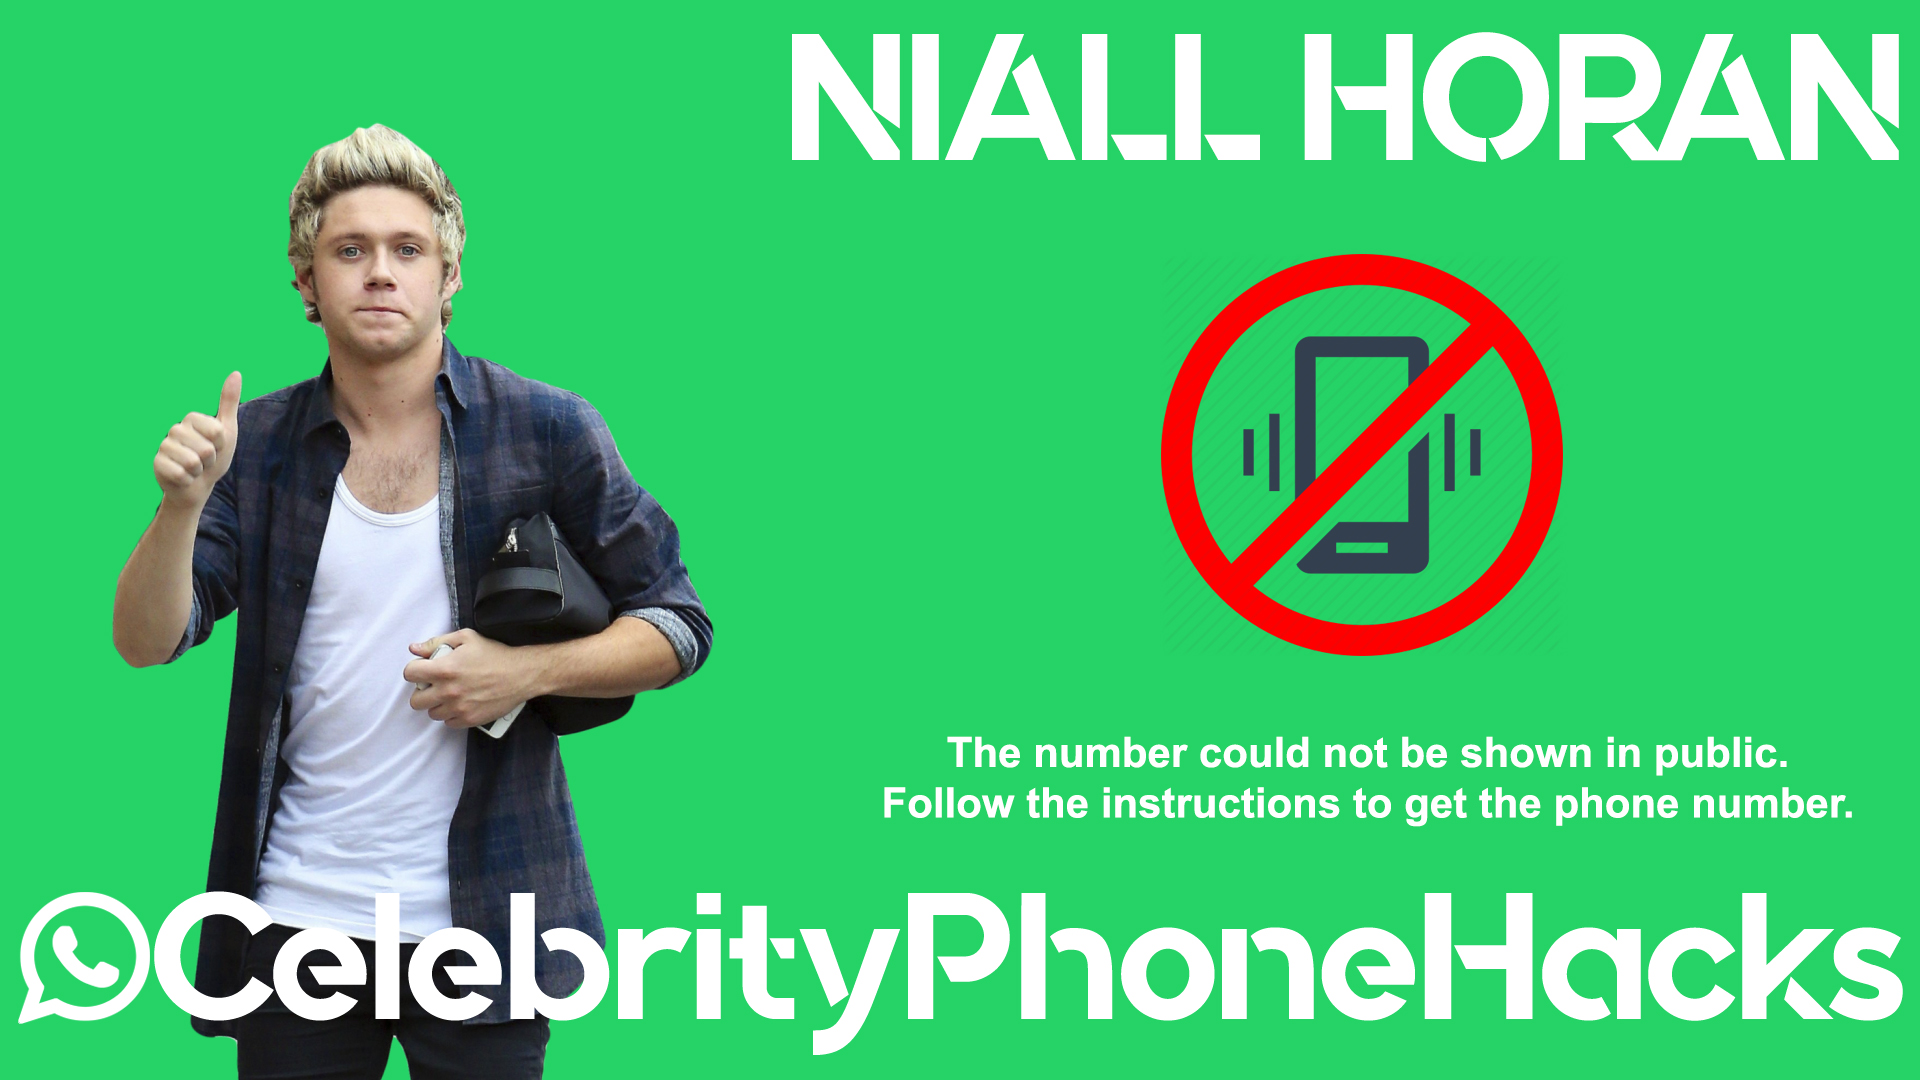 Niall Horan real phone number 2019 whatsapp hacked leaked